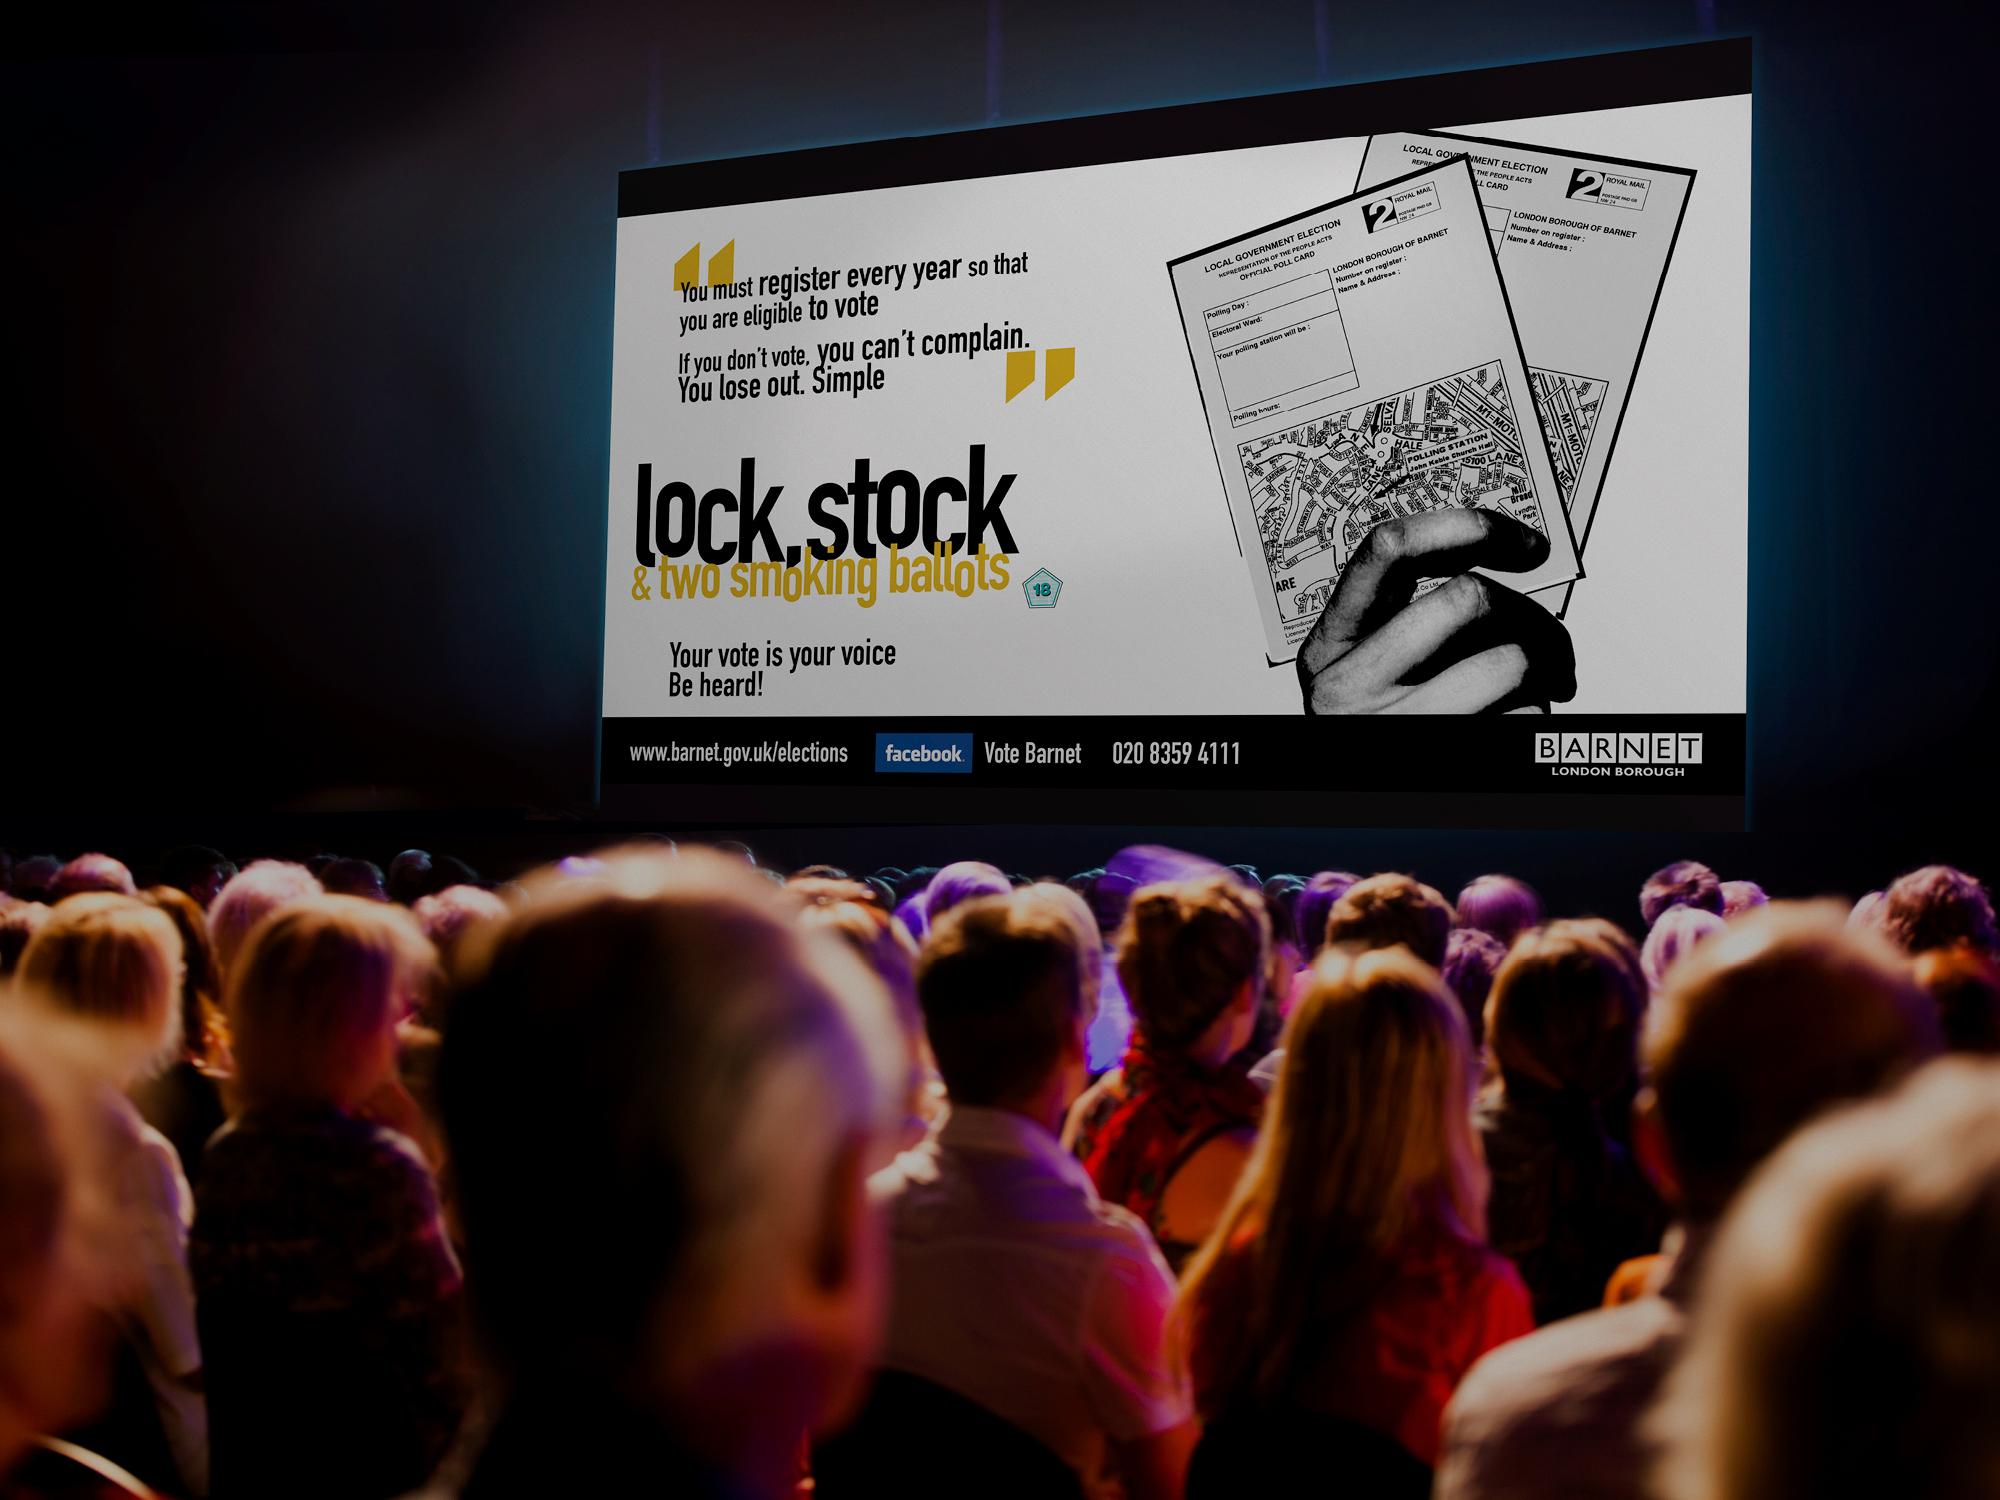 Cinema Ad - Lock, Stock